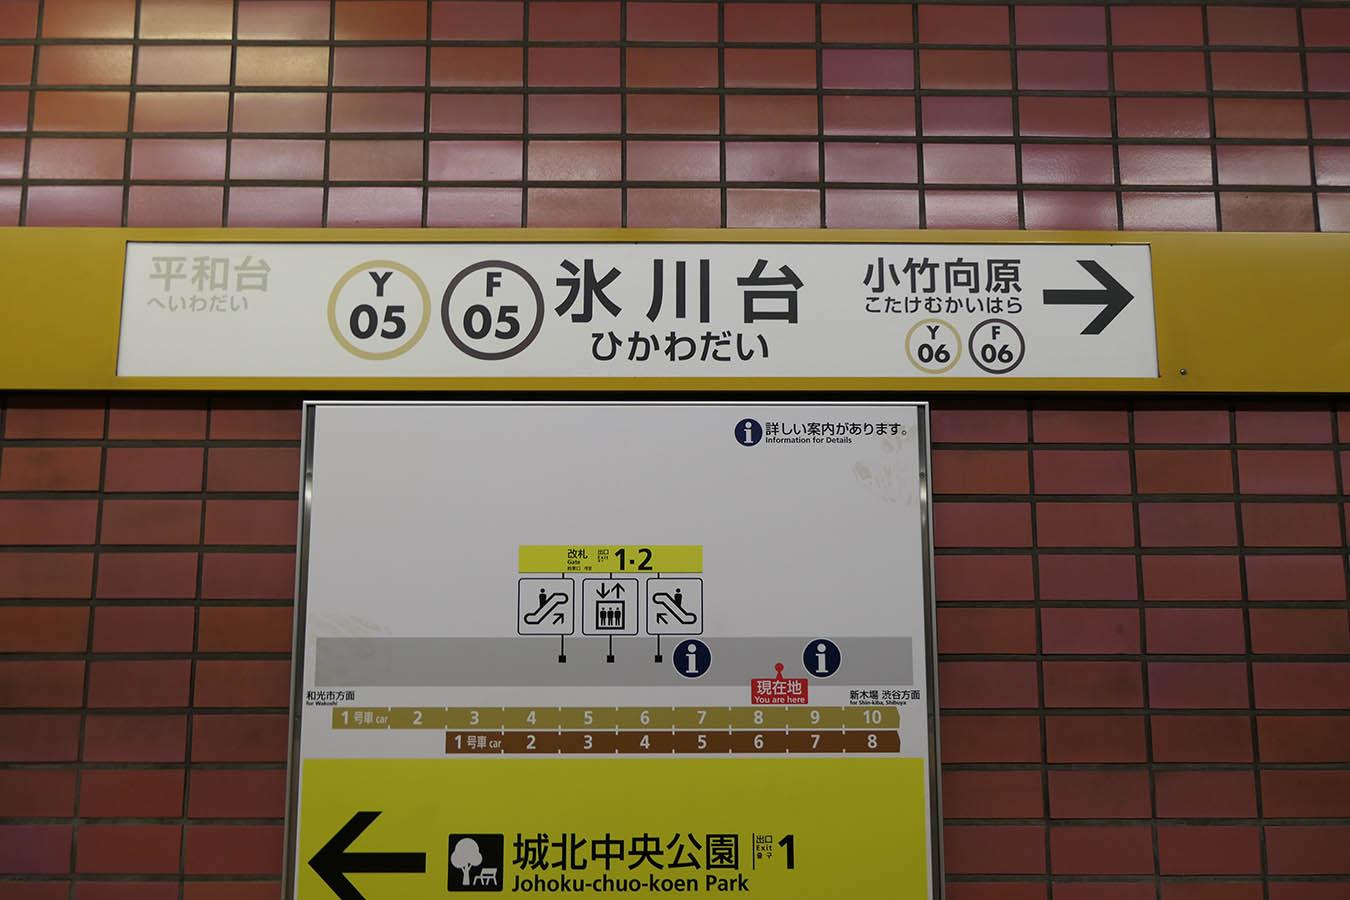 Y05_photo07.jpg